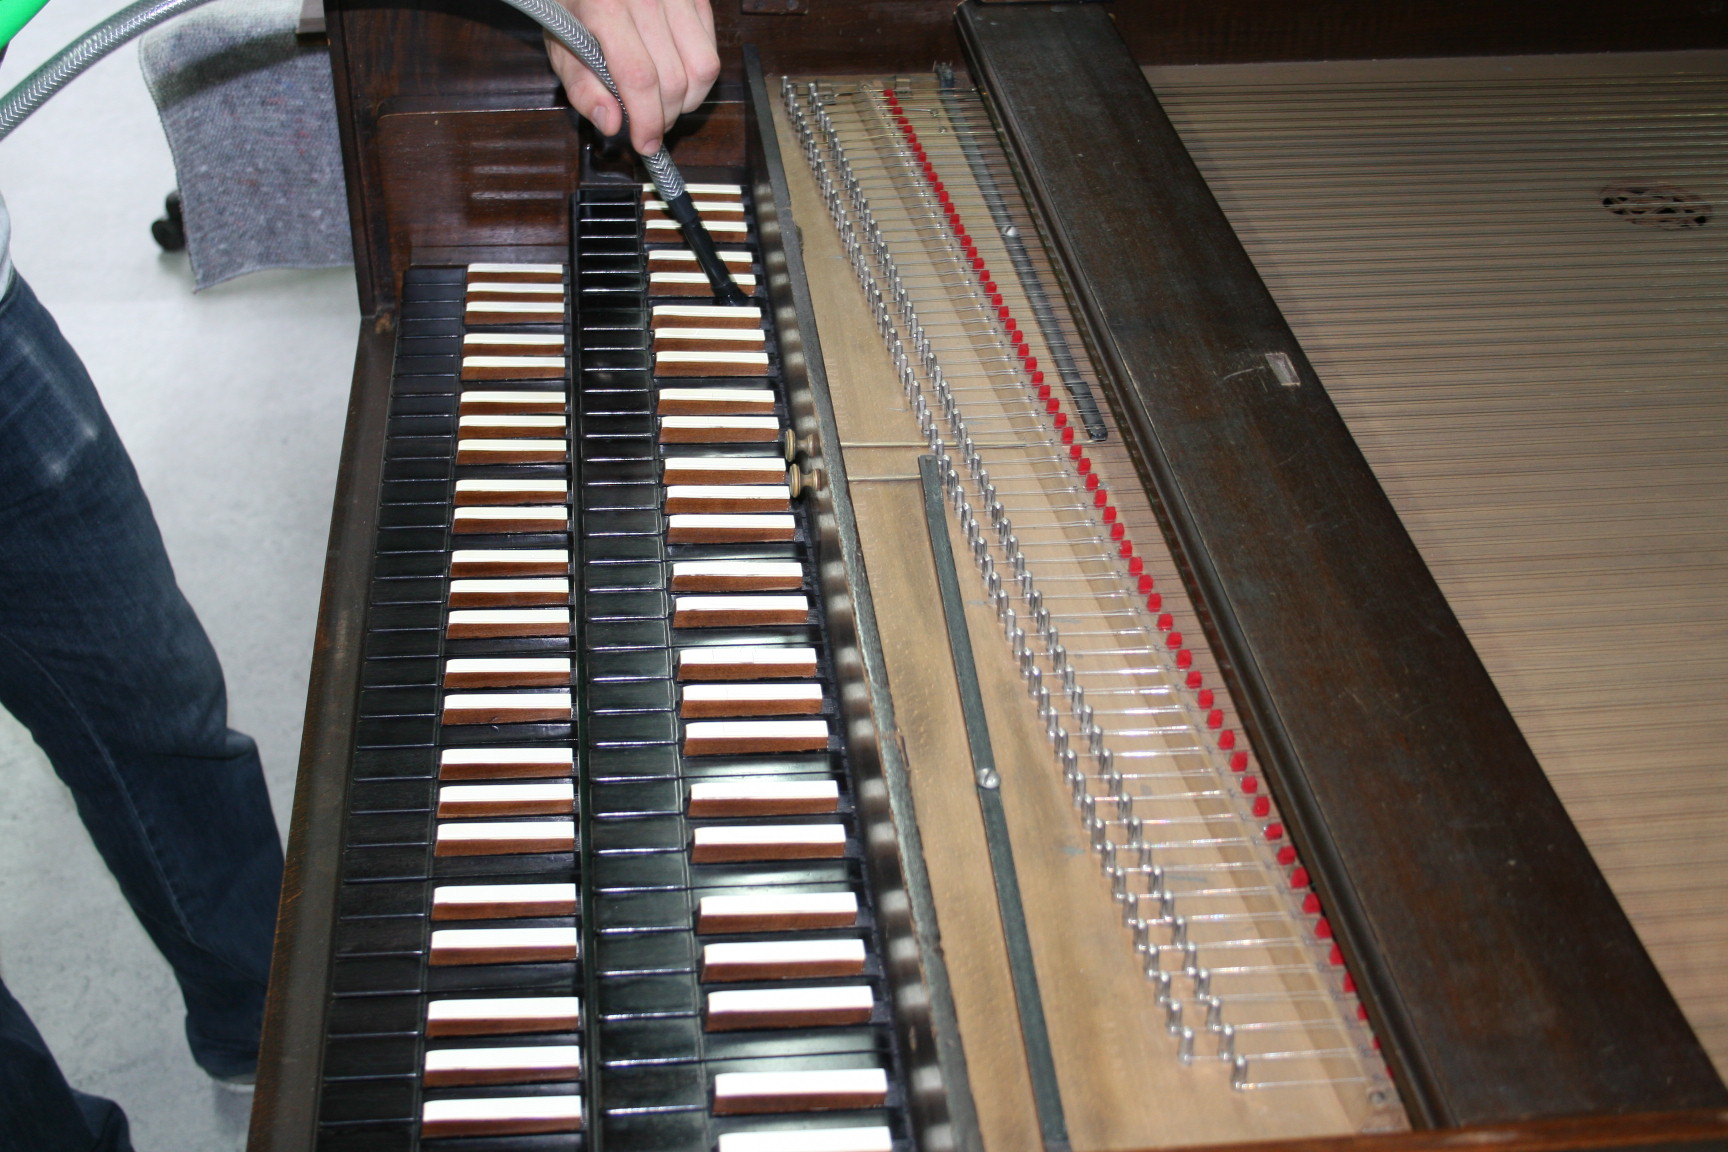 historisches museum frankfurt: Chembalo-Tastatur